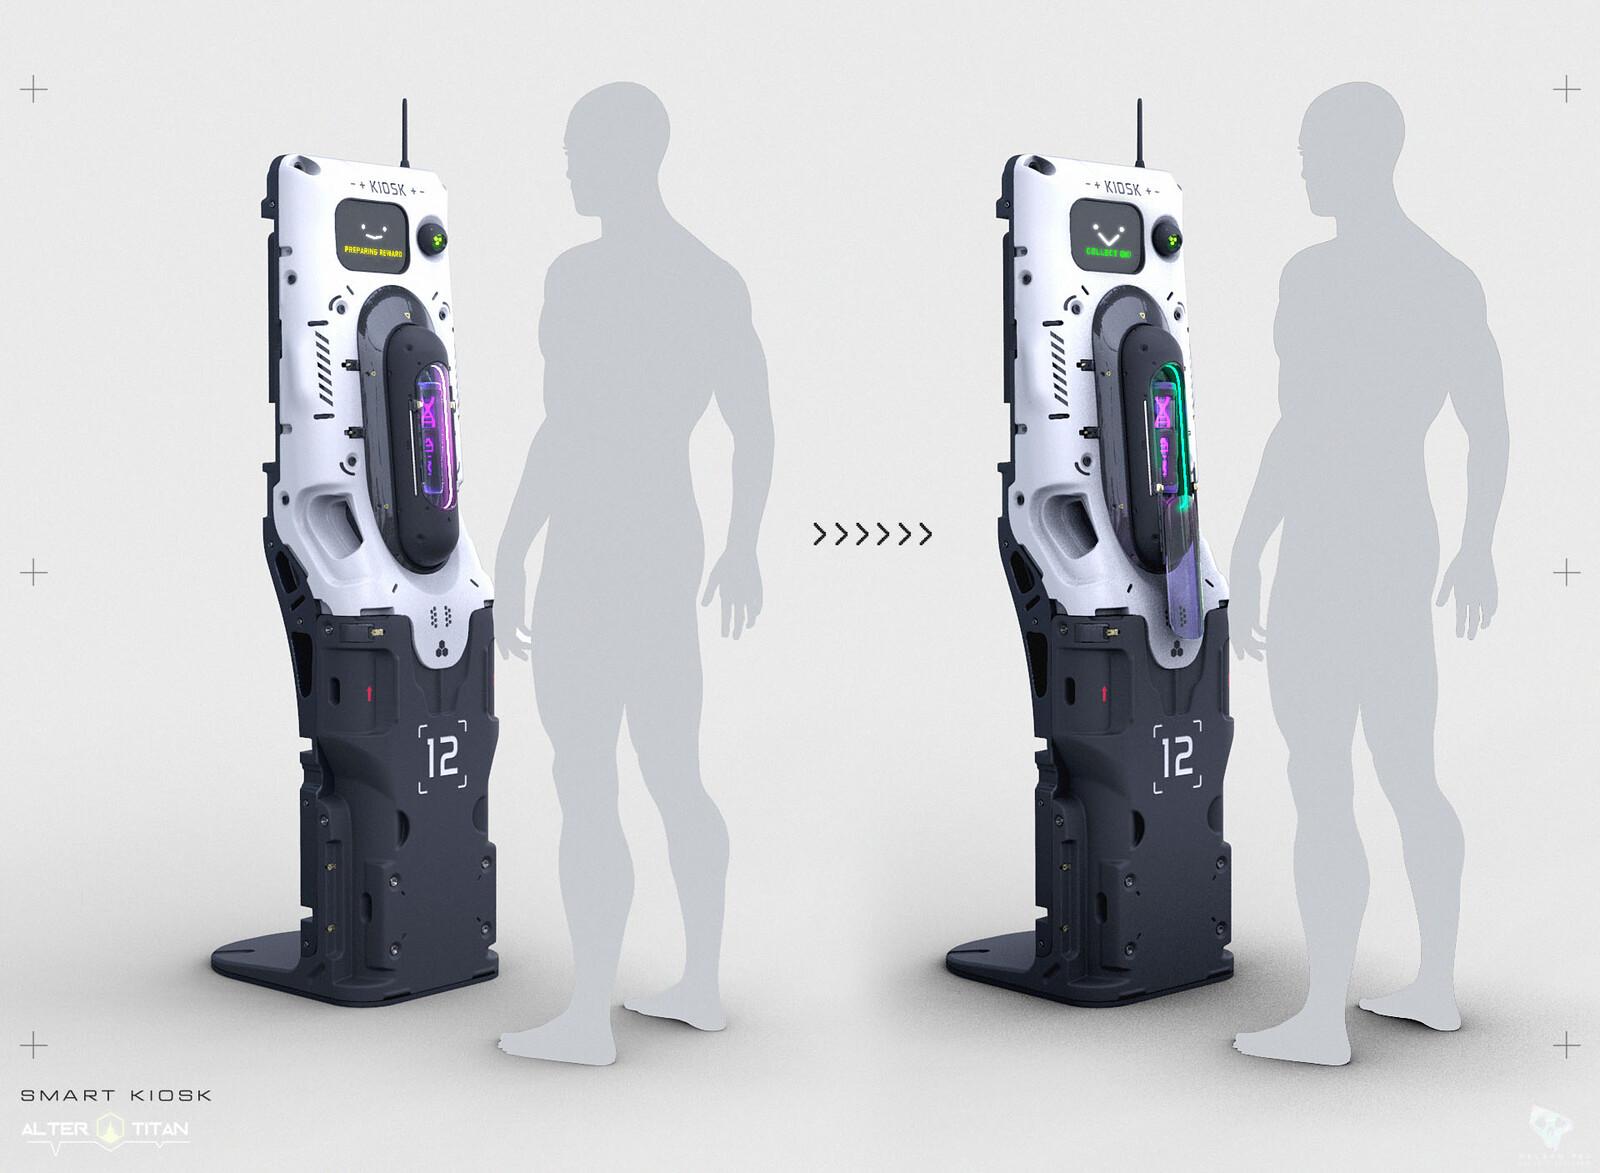 Friendly Kiosk station that dispenses DNA sample carriers